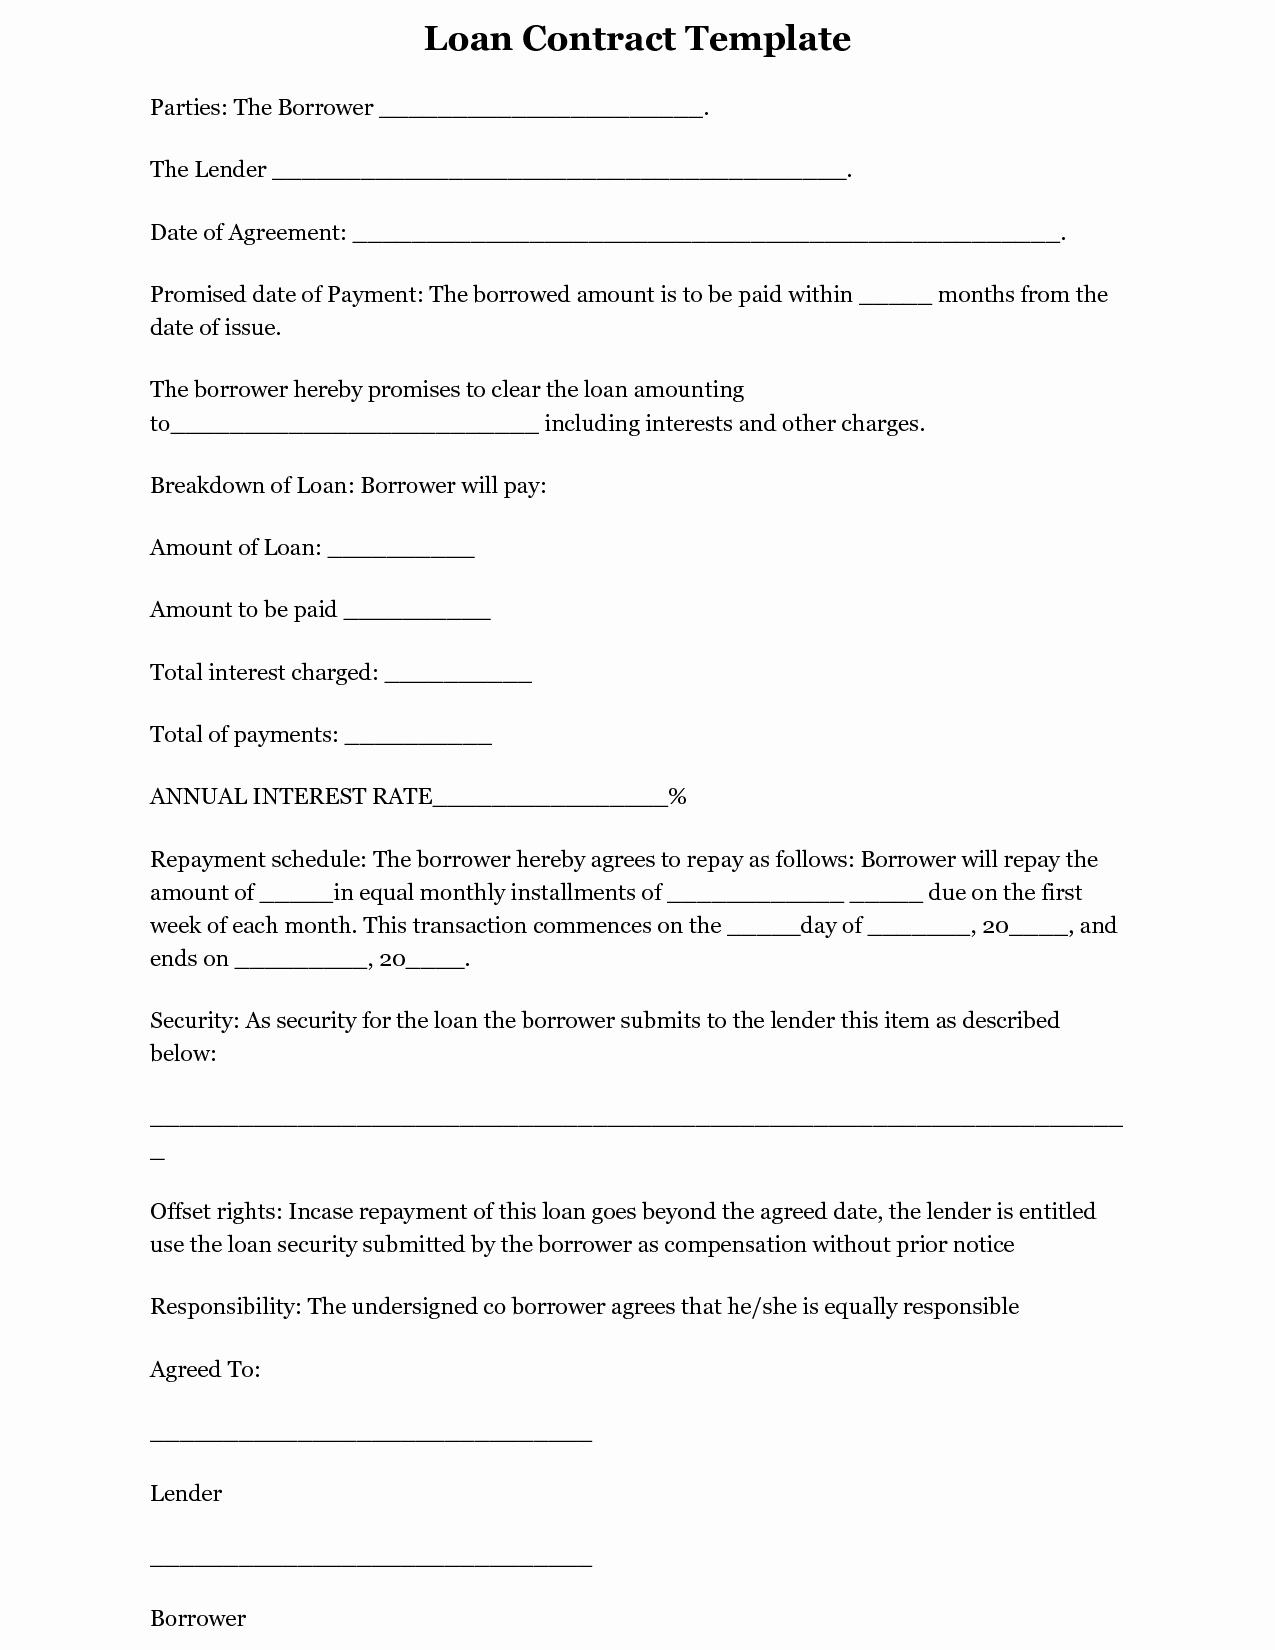 Personal Loan Agreement Template Word Luxury Simple Loan Agreement